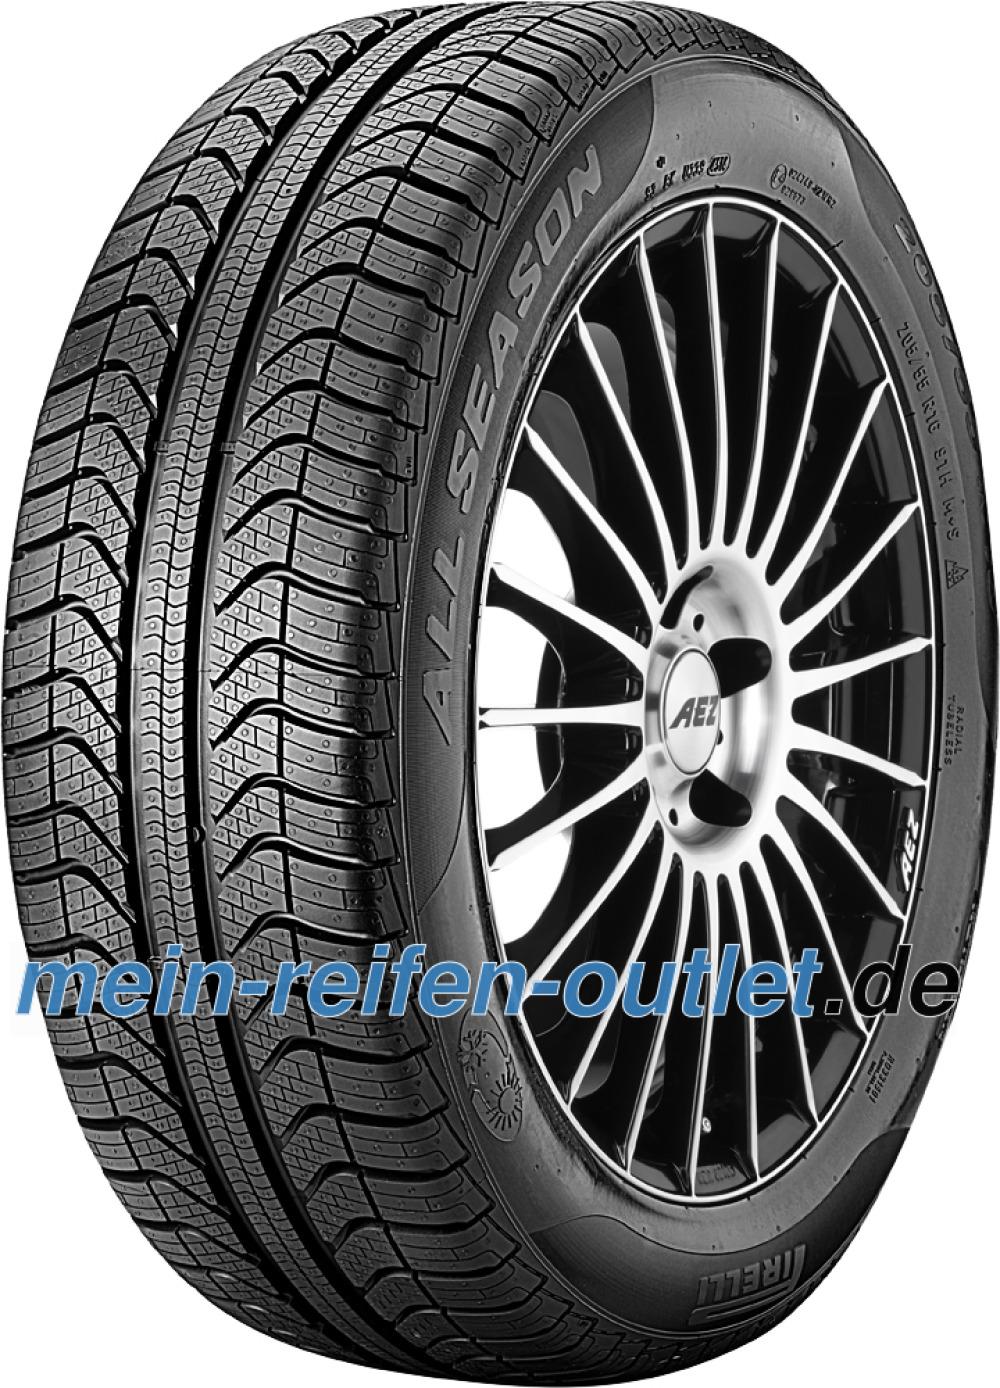 Pirelli Cinturato All Season ( 225/45 R17 94V XL , Seal Inside )